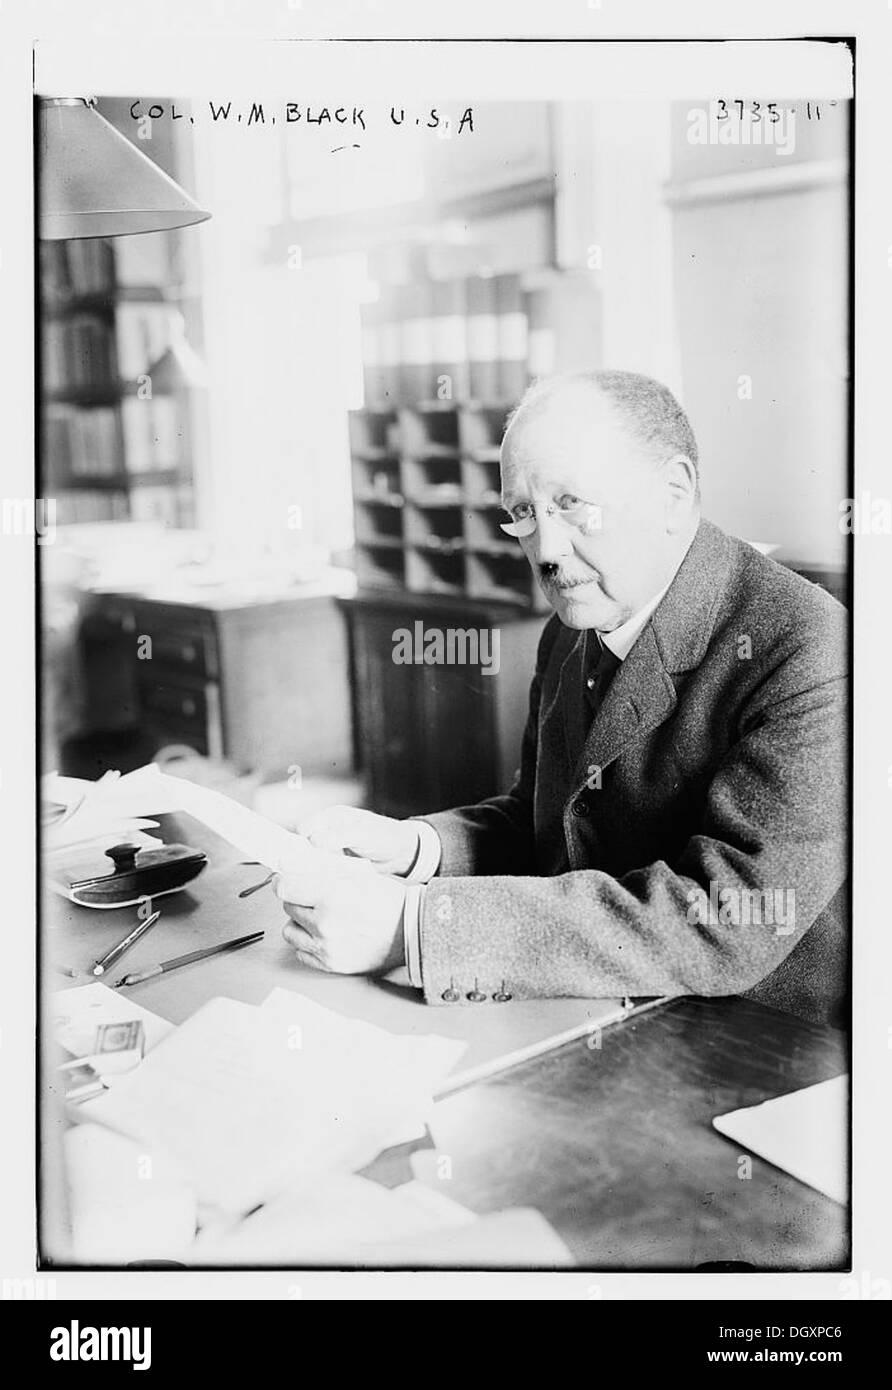 Col. W.M. Black U.S.A. (LOC) - Stock Image